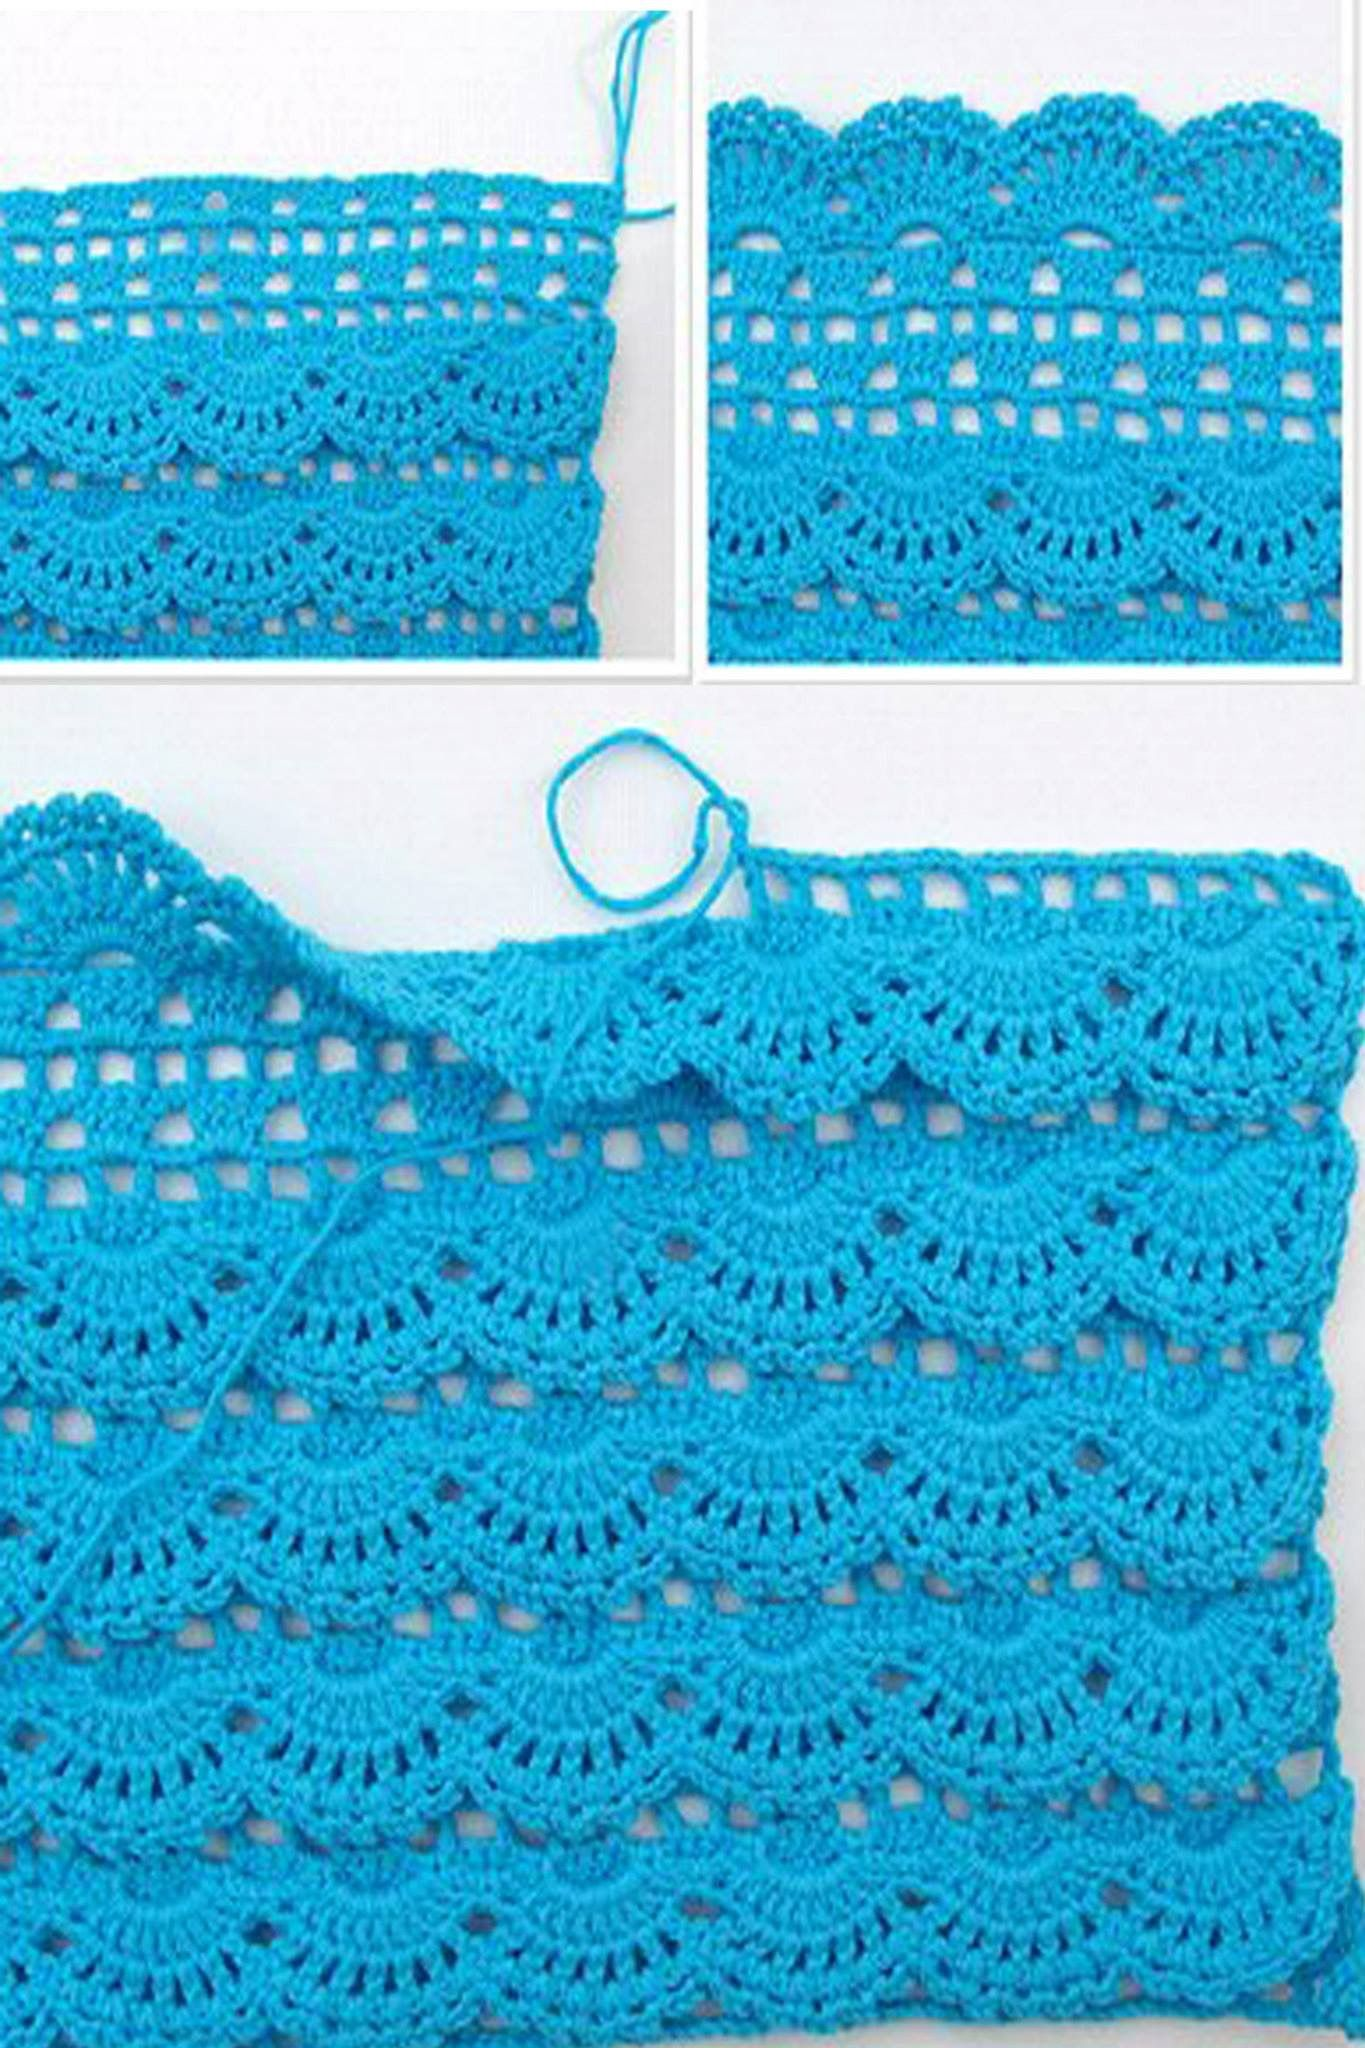 Pin de Patiolantern en crochet stitches | Pinterest | Carpetas ...